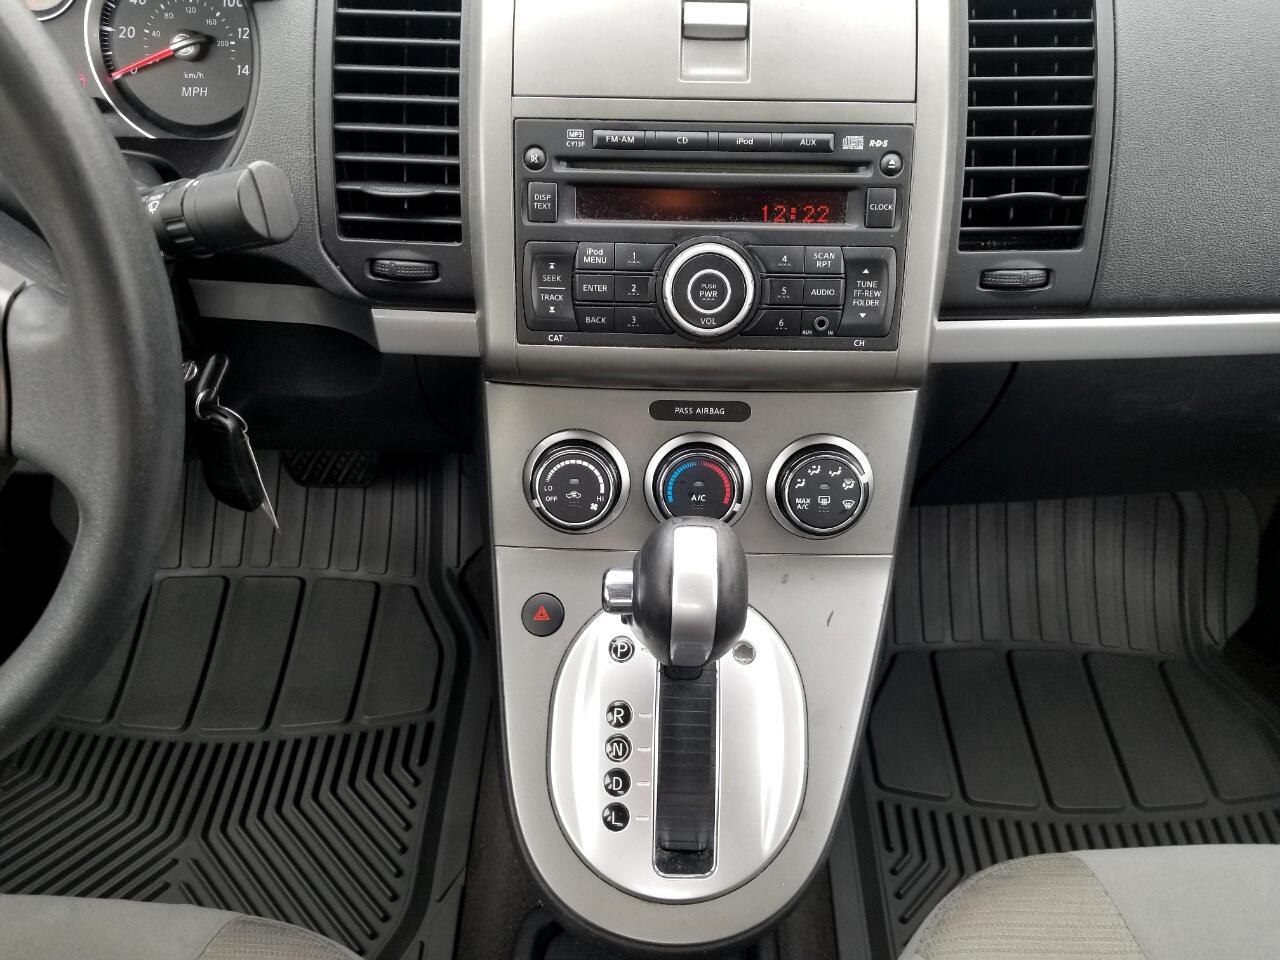 2011 Nissan Sentra 4dr Sdn I4 CVT 2.0 S